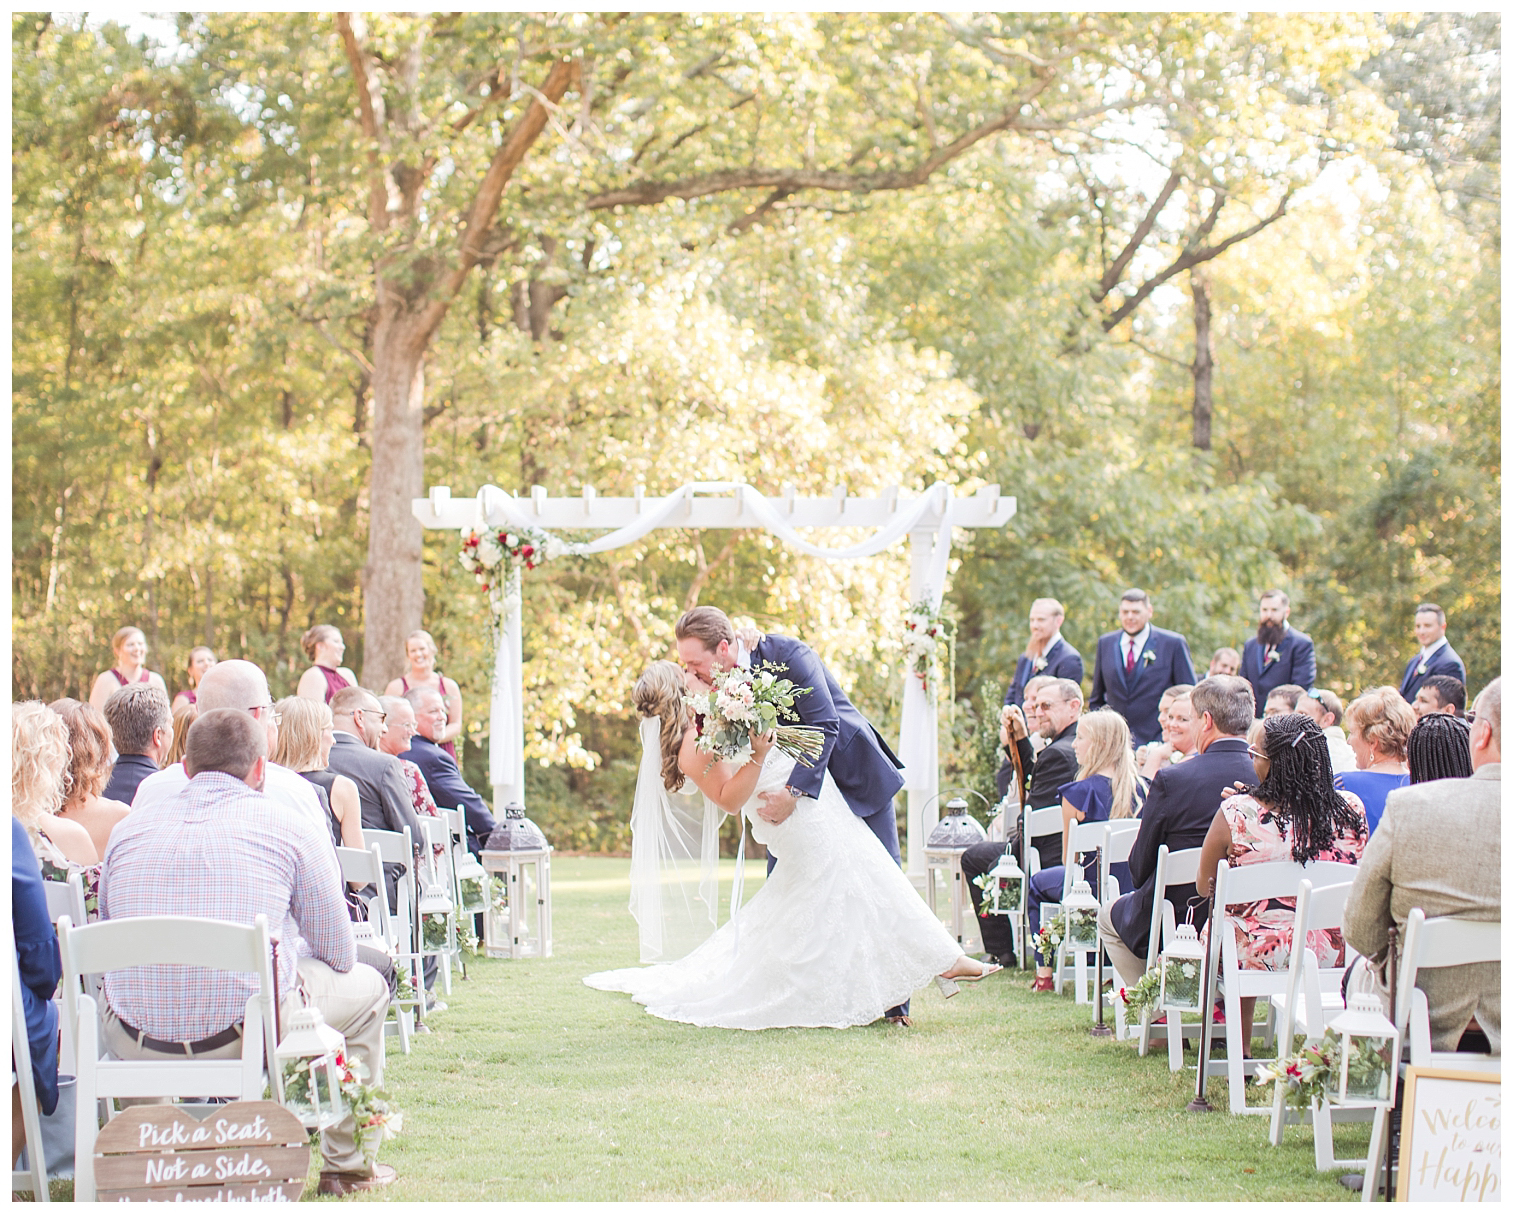 Halie & Michael|Fall Wedding| VA Wedding Photographer